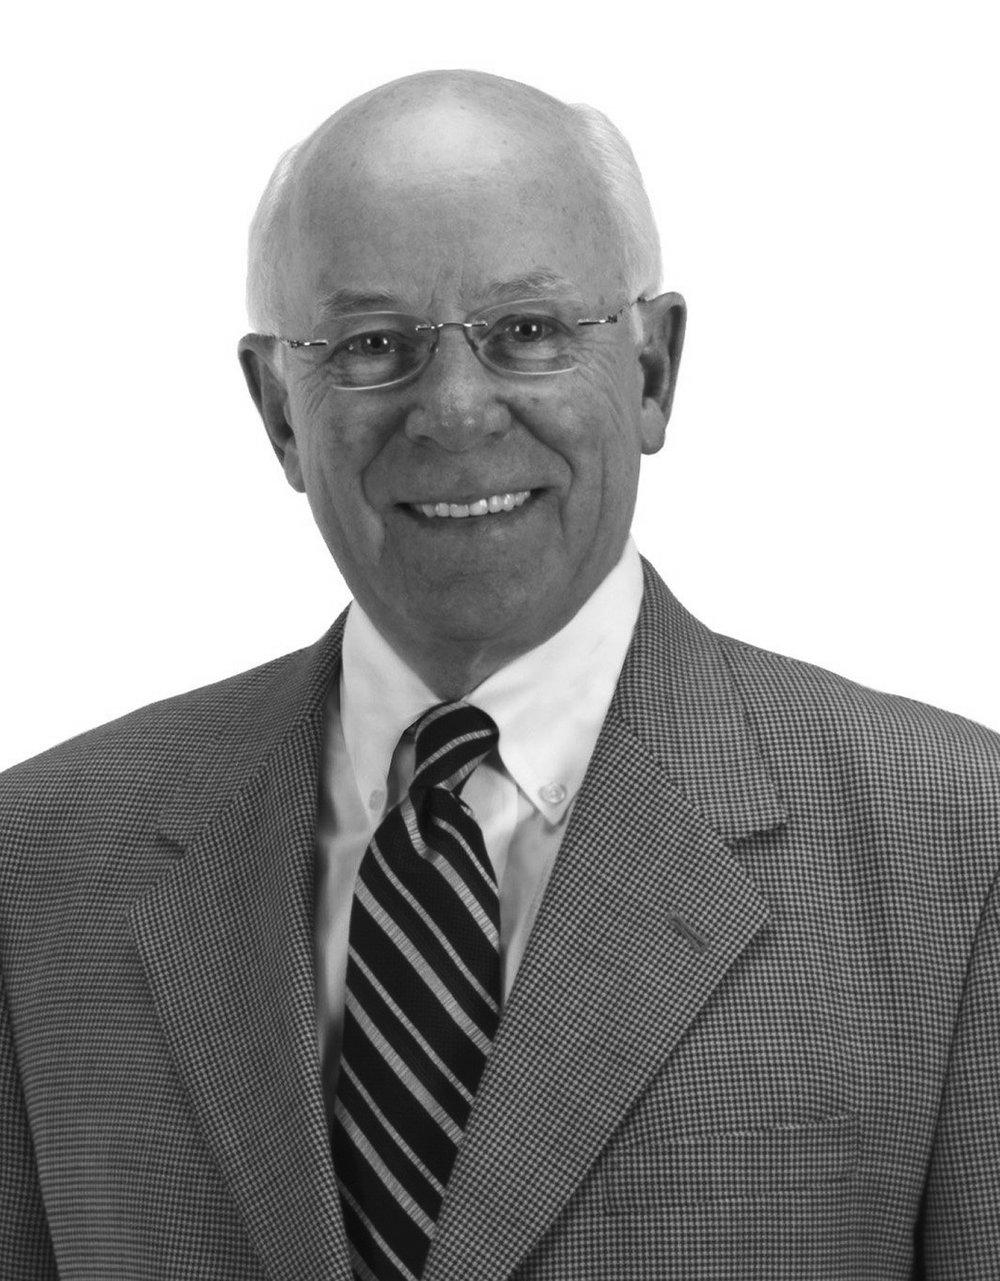 K. Bruce Lauritsen